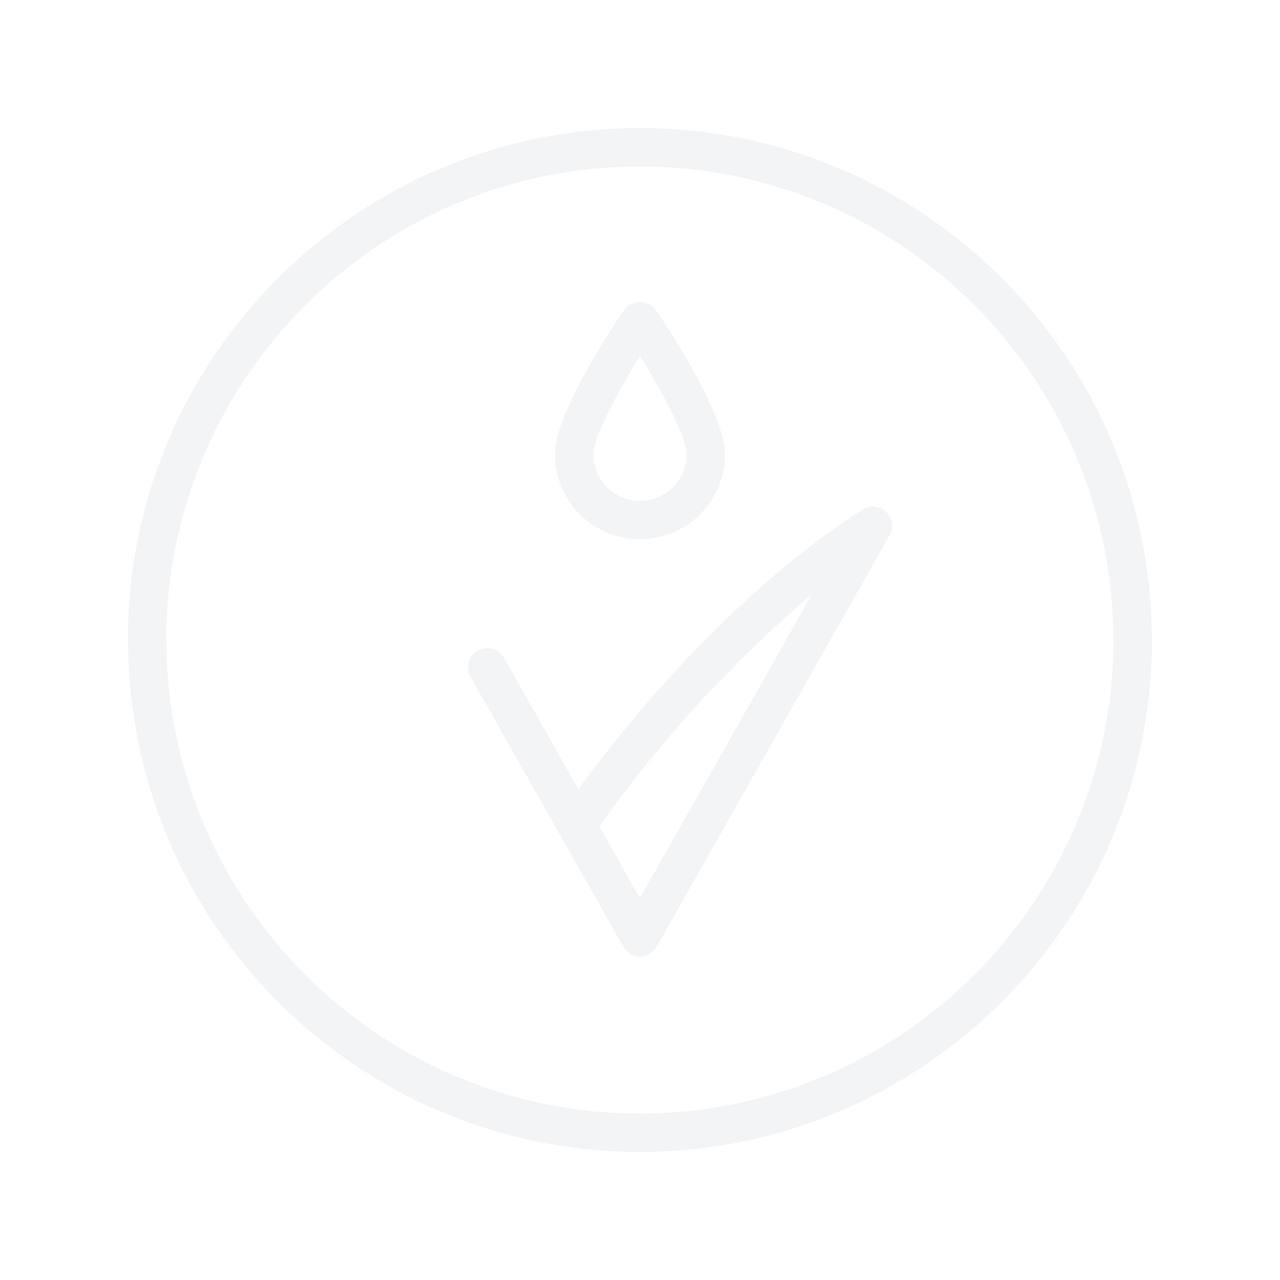 MUA Blush Perfection румяна для лица 5.3g